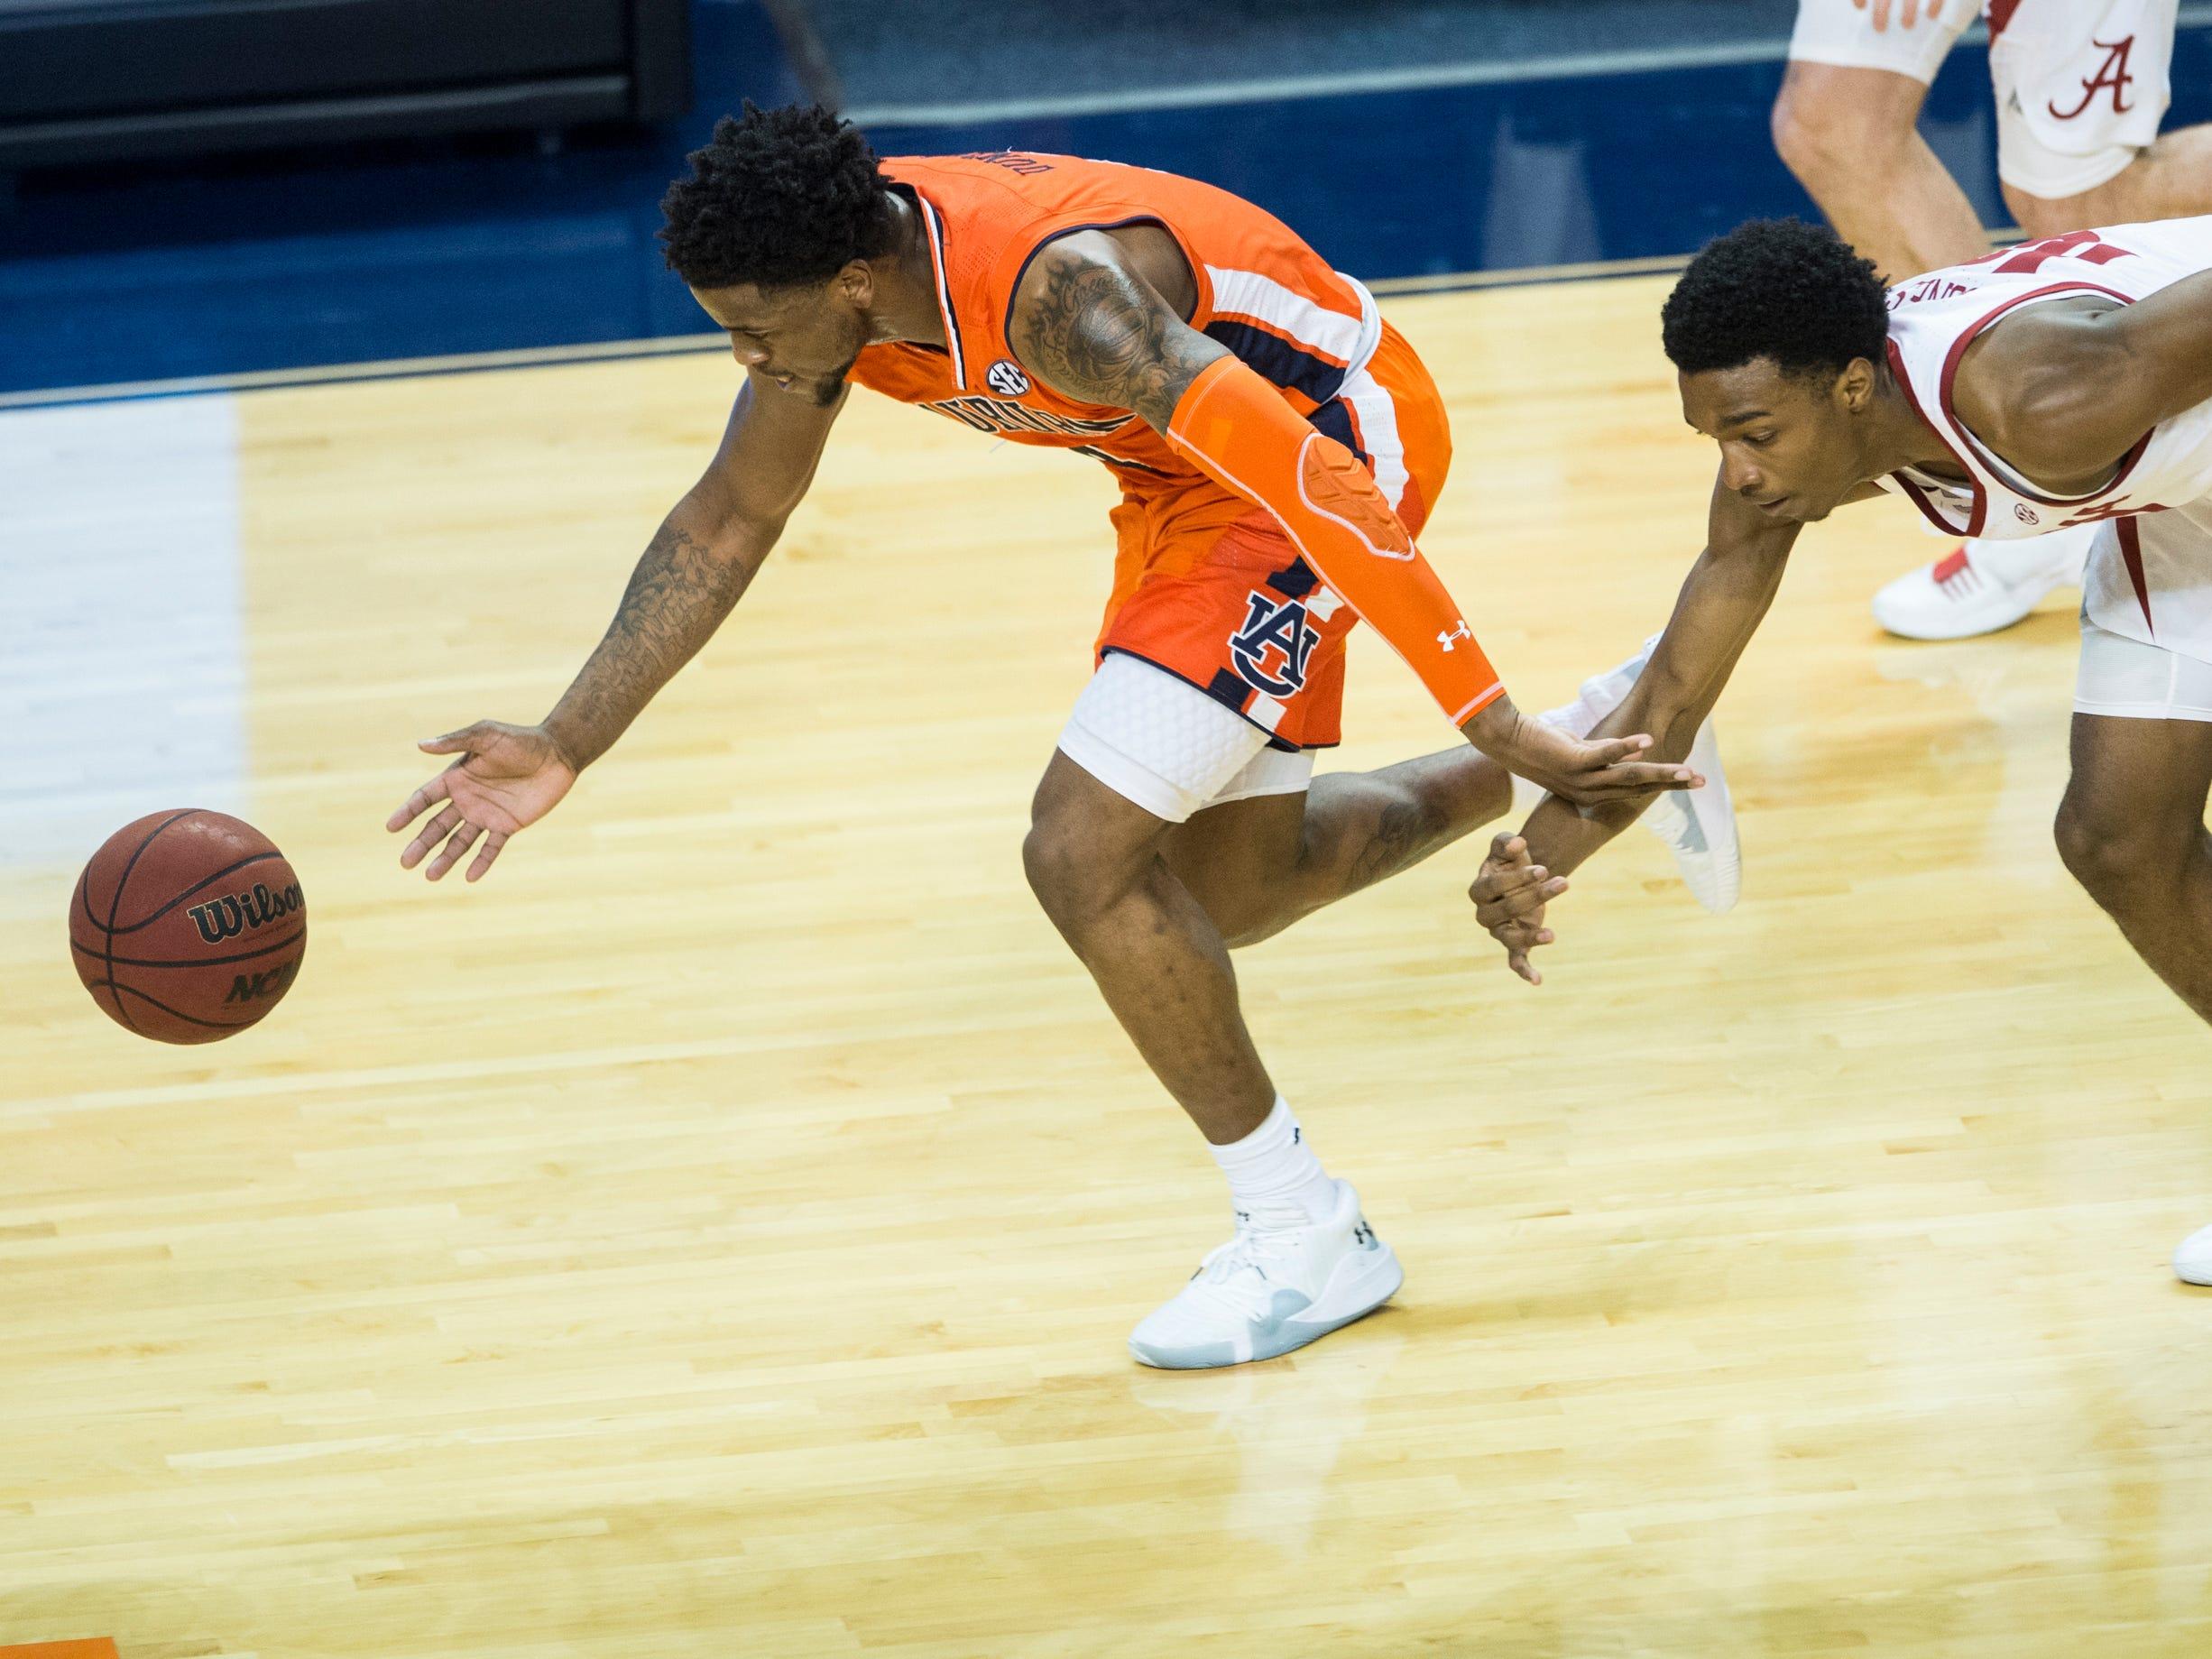 Auburn guard Malik Dunbar (4) and Alabama guard Herbert Jones (10) fight for a loose ball at Auburn Arena in Auburn, Ala., on Saturday, Feb. 2, 2019. Auburn defeated Alabama 84-63.